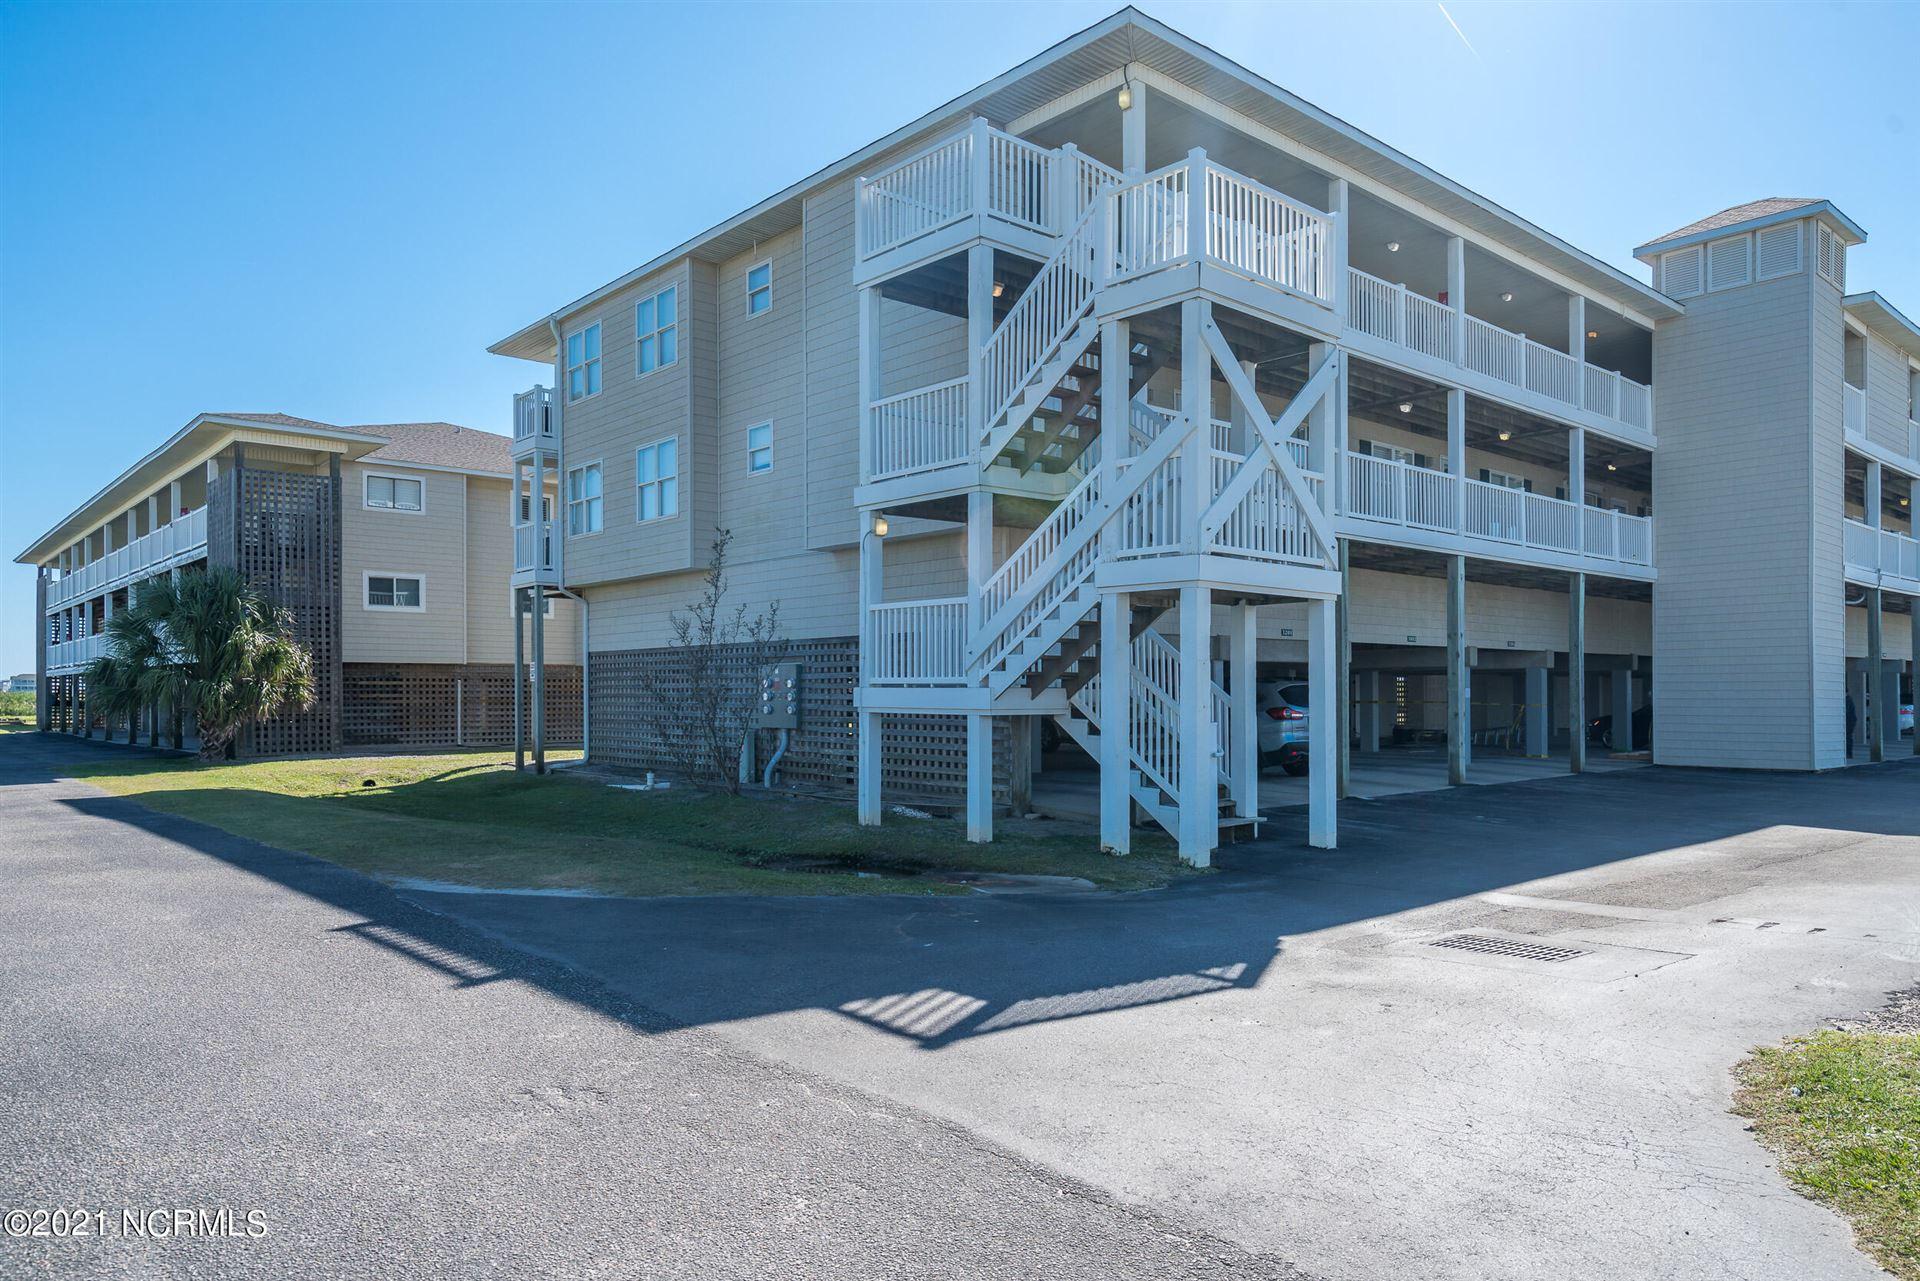 Photo of 122 SE 58th Street #Apt 202, Oak Island, NC 28465 (MLS # 100295591)